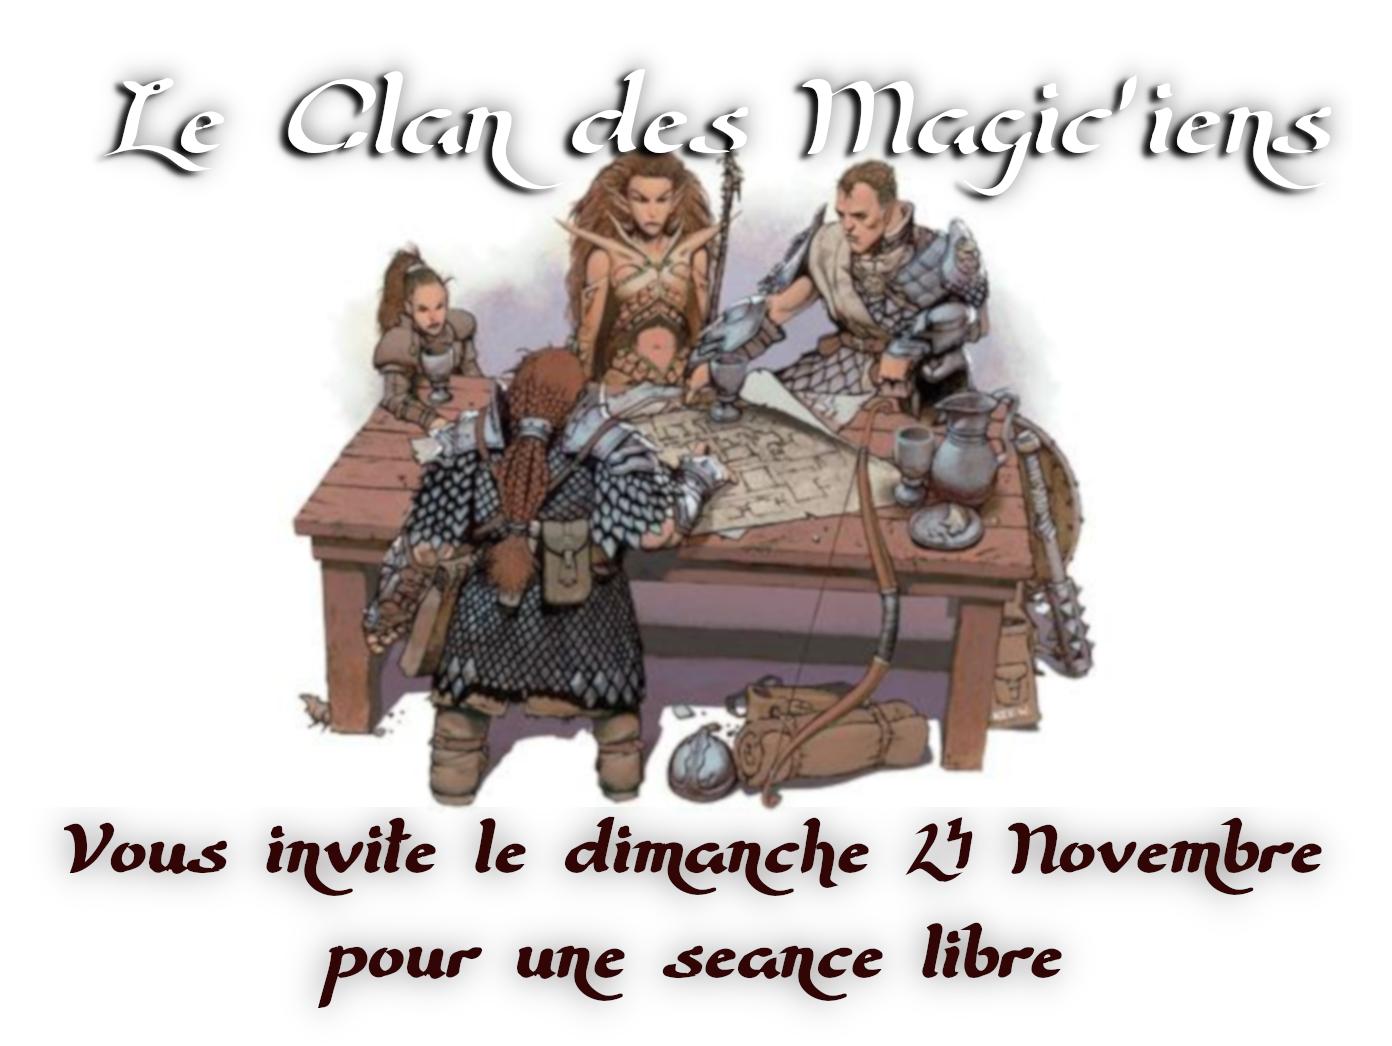 Dimanche 24 Novembre : Séance libre 1Oppw